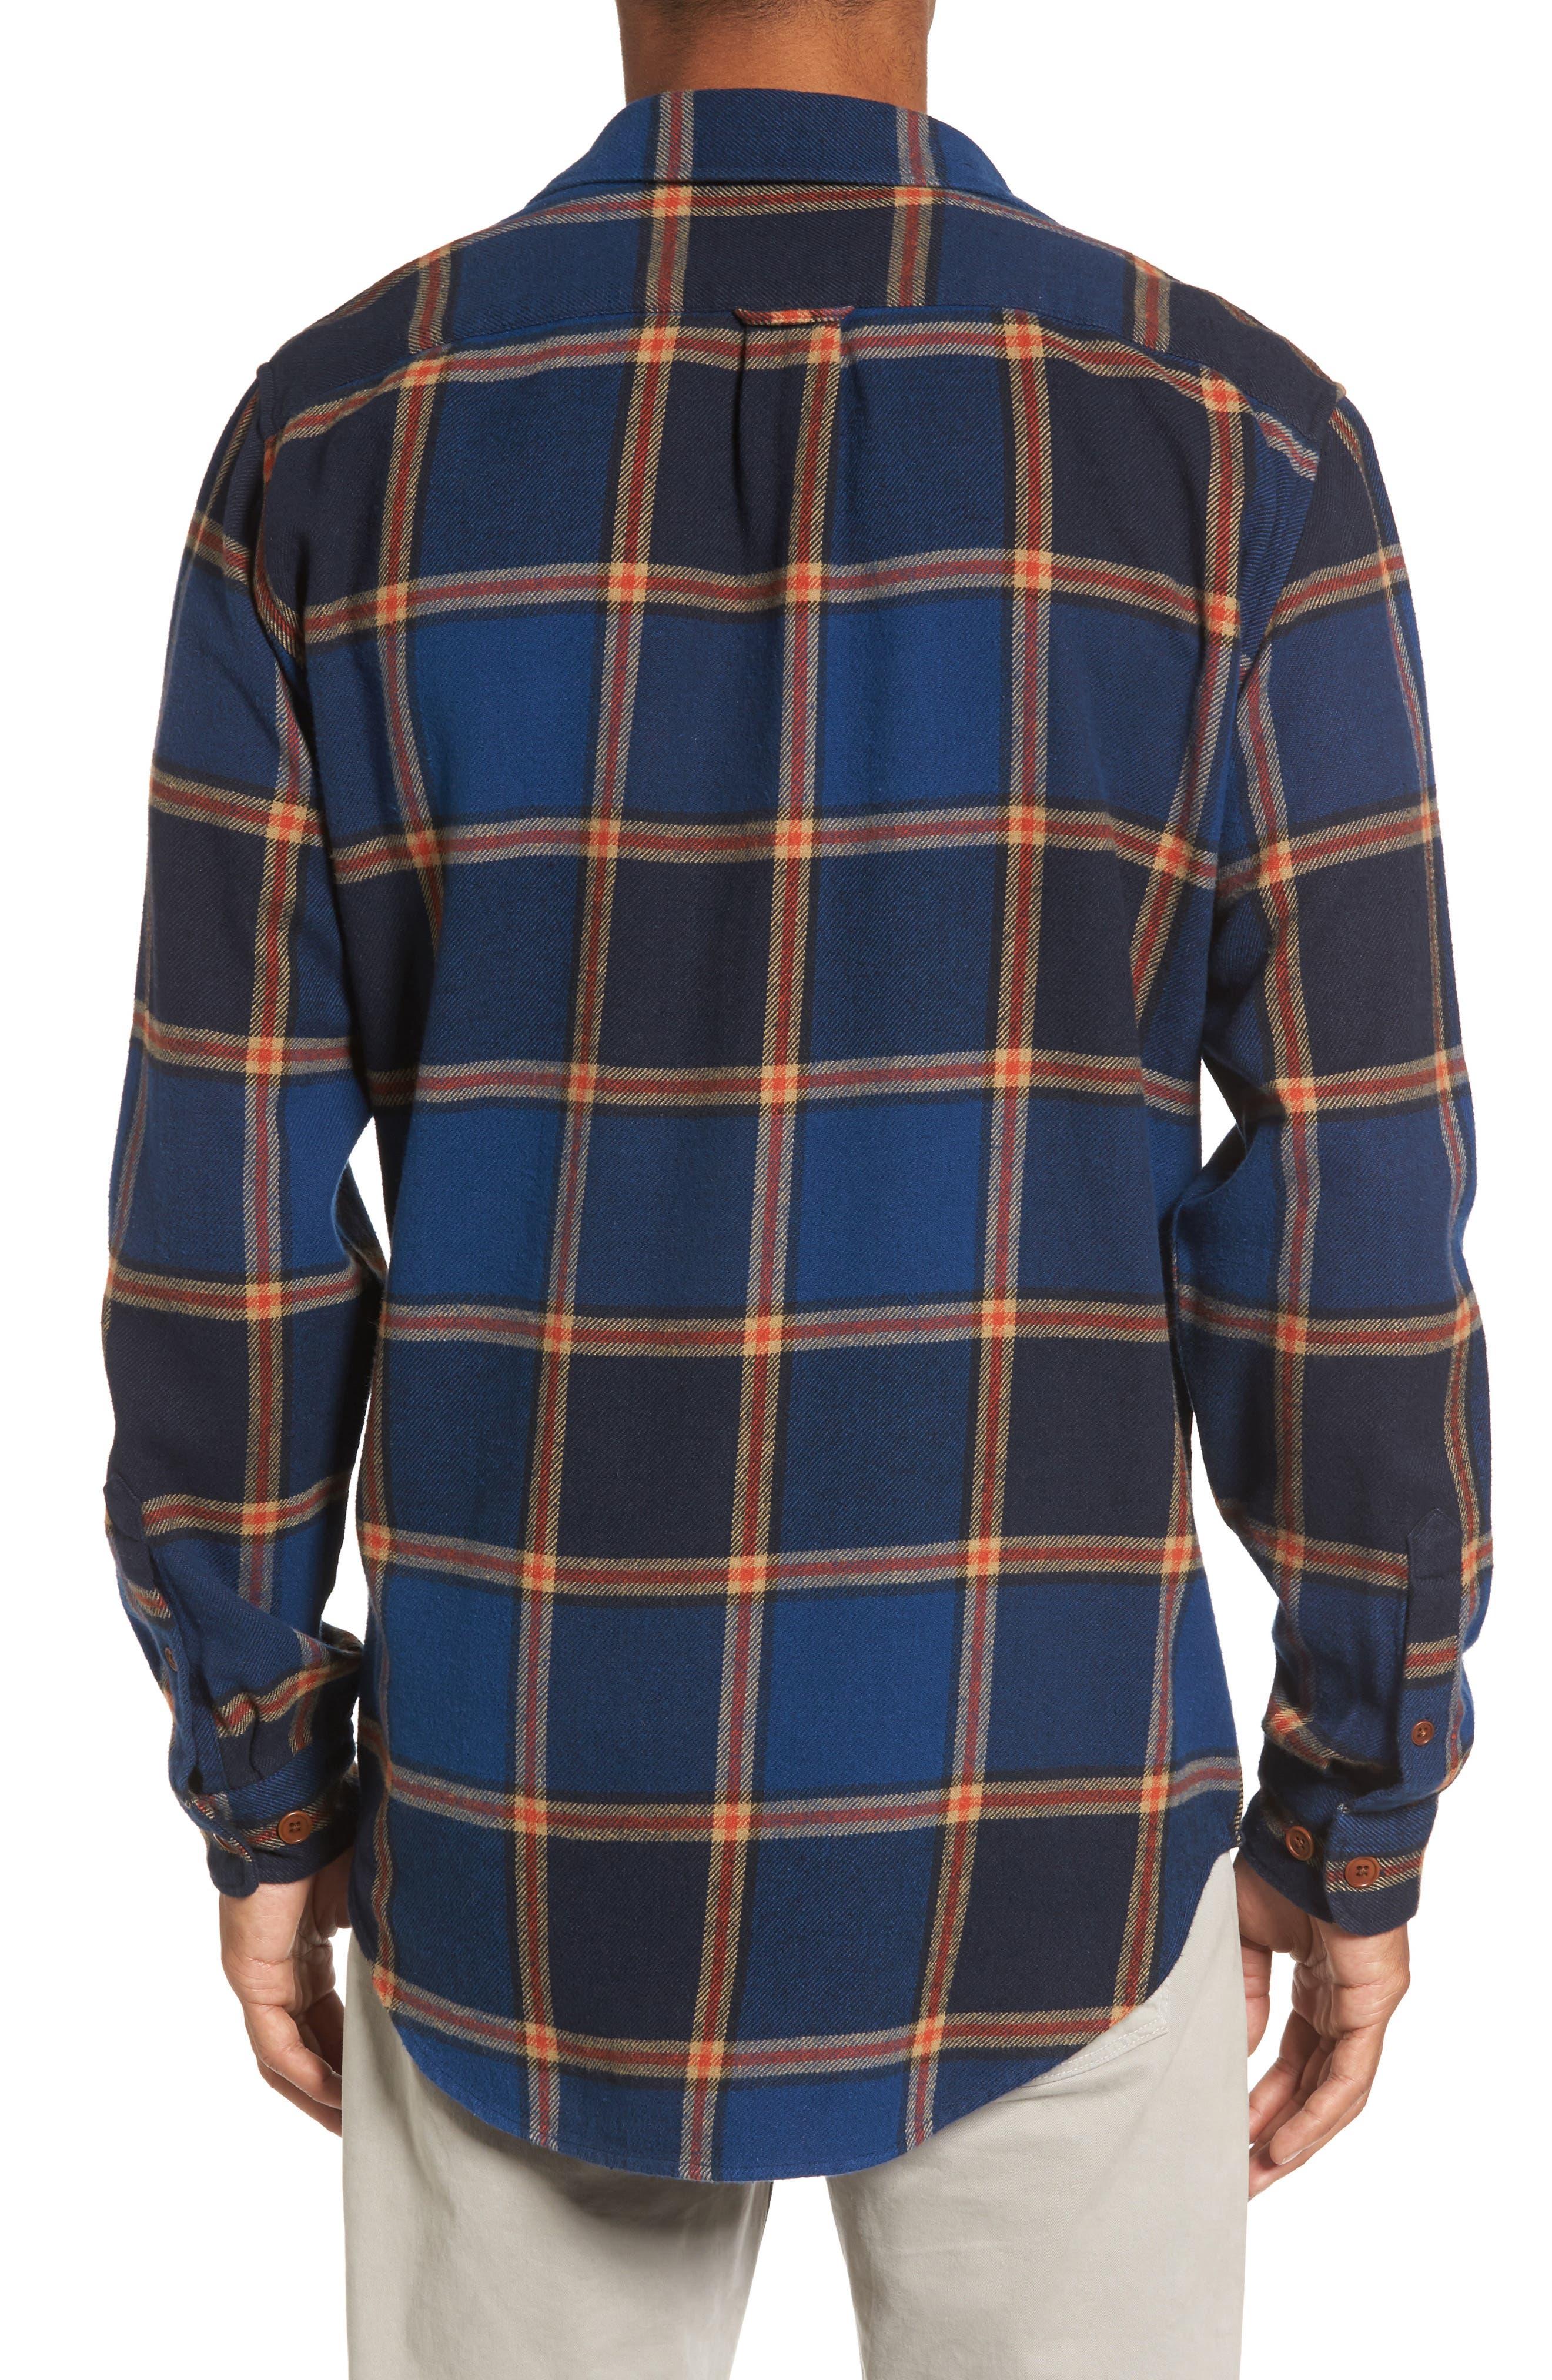 R1 Check Twill Shirt Jacket,                             Alternate thumbnail 2, color,                             410